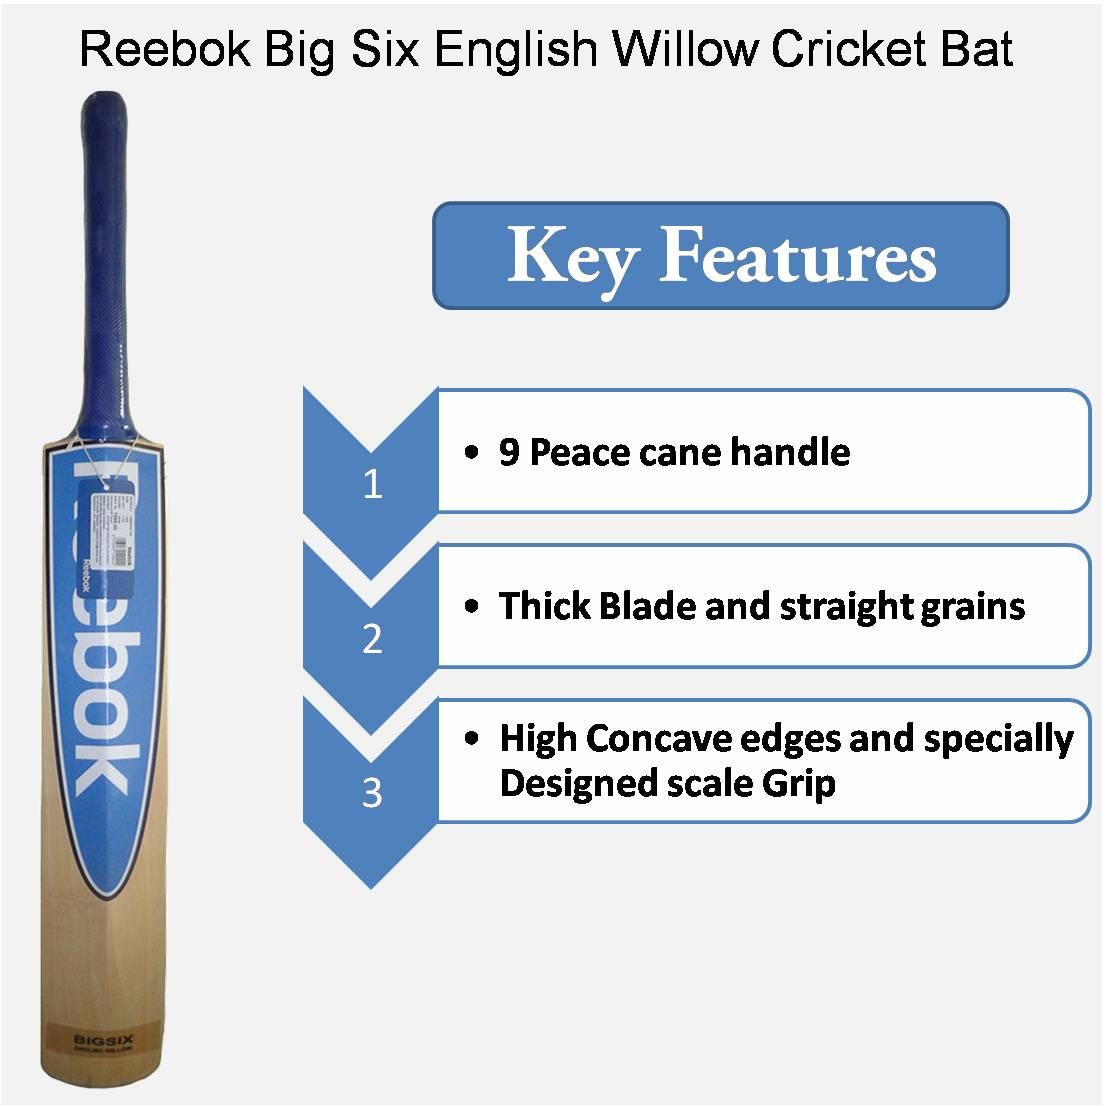 Reebok Big Six English Willow Cricket Bat